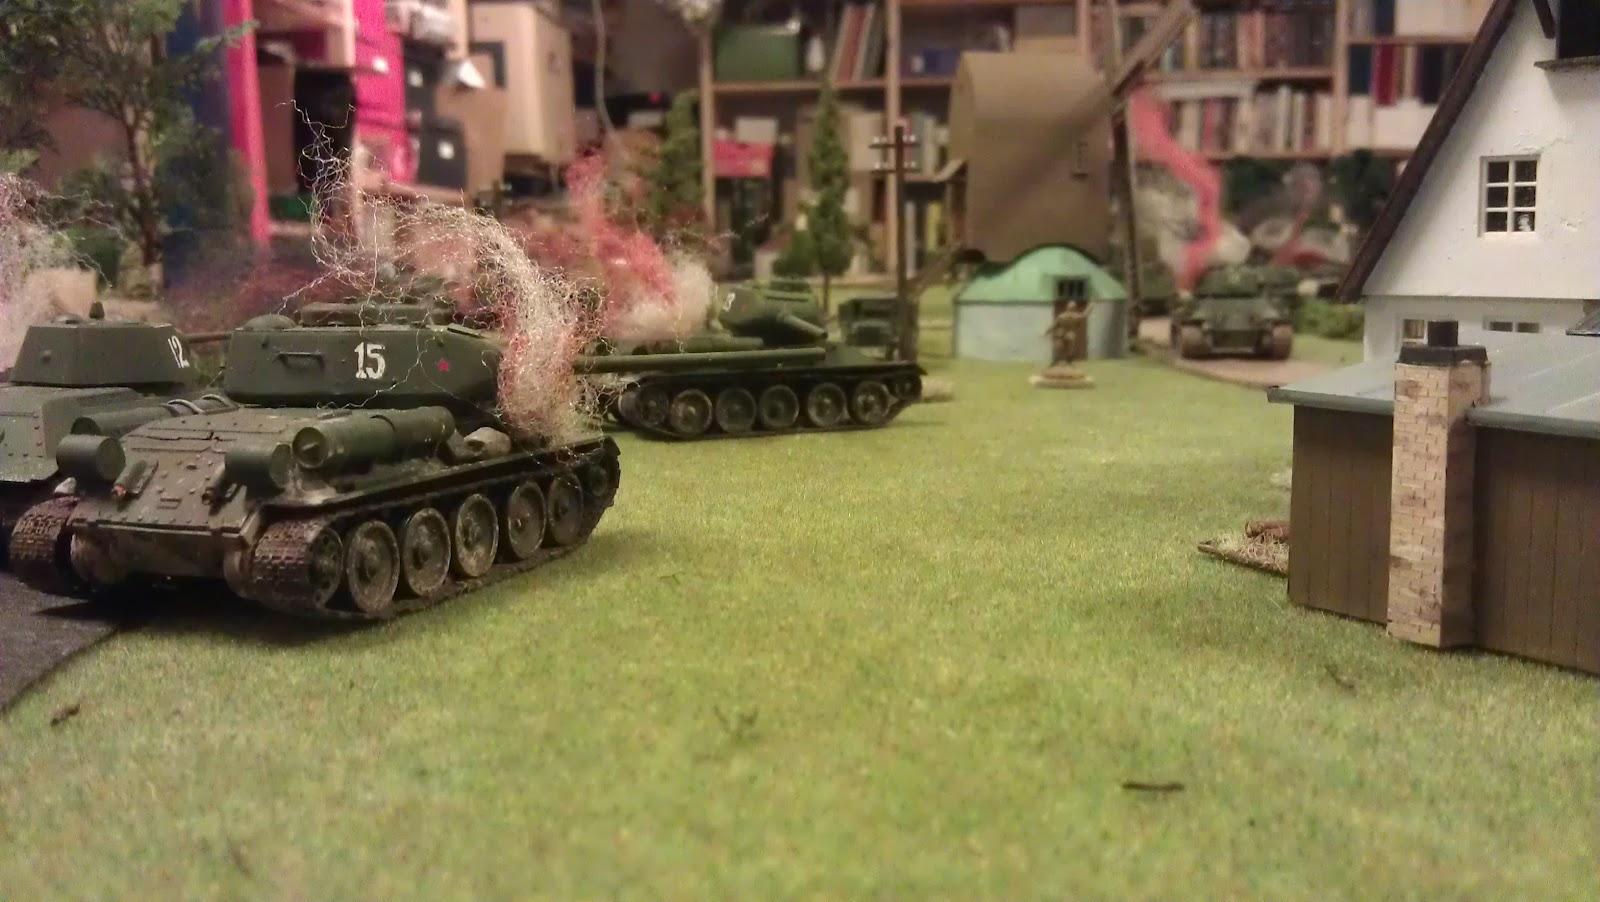 The tank graveyard